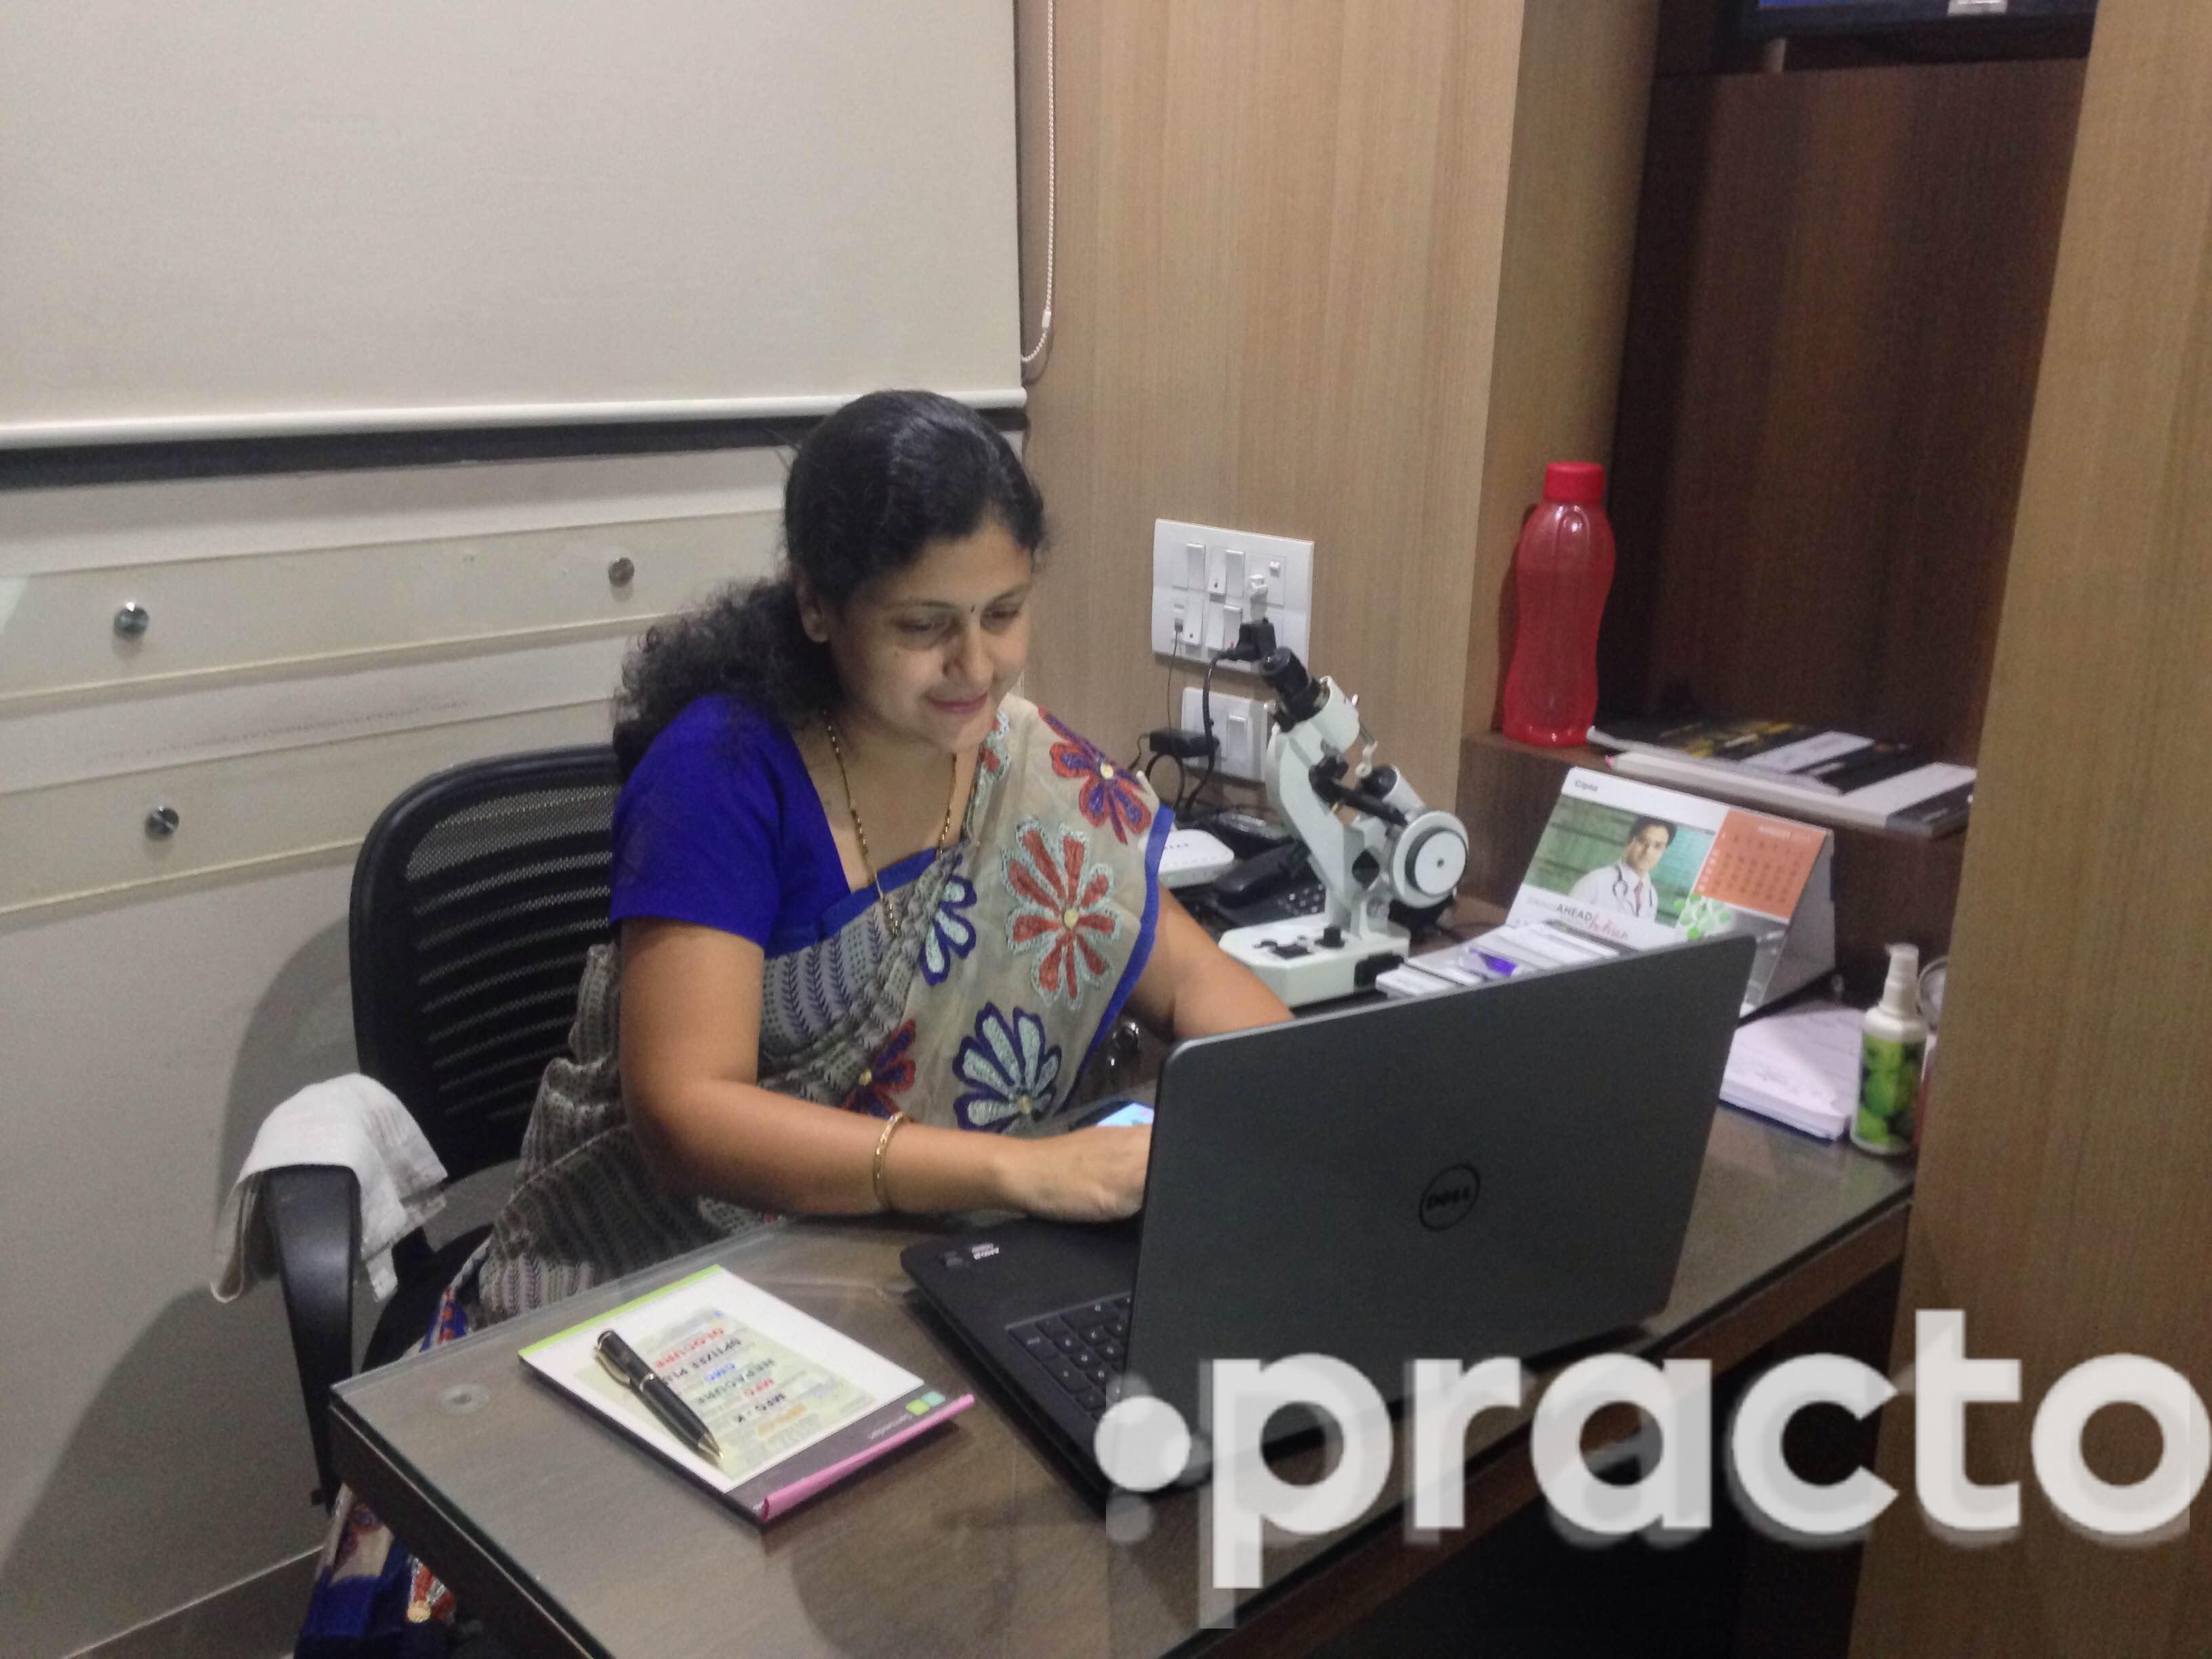 Dr. Aboli Baijal - Ophthalmologist